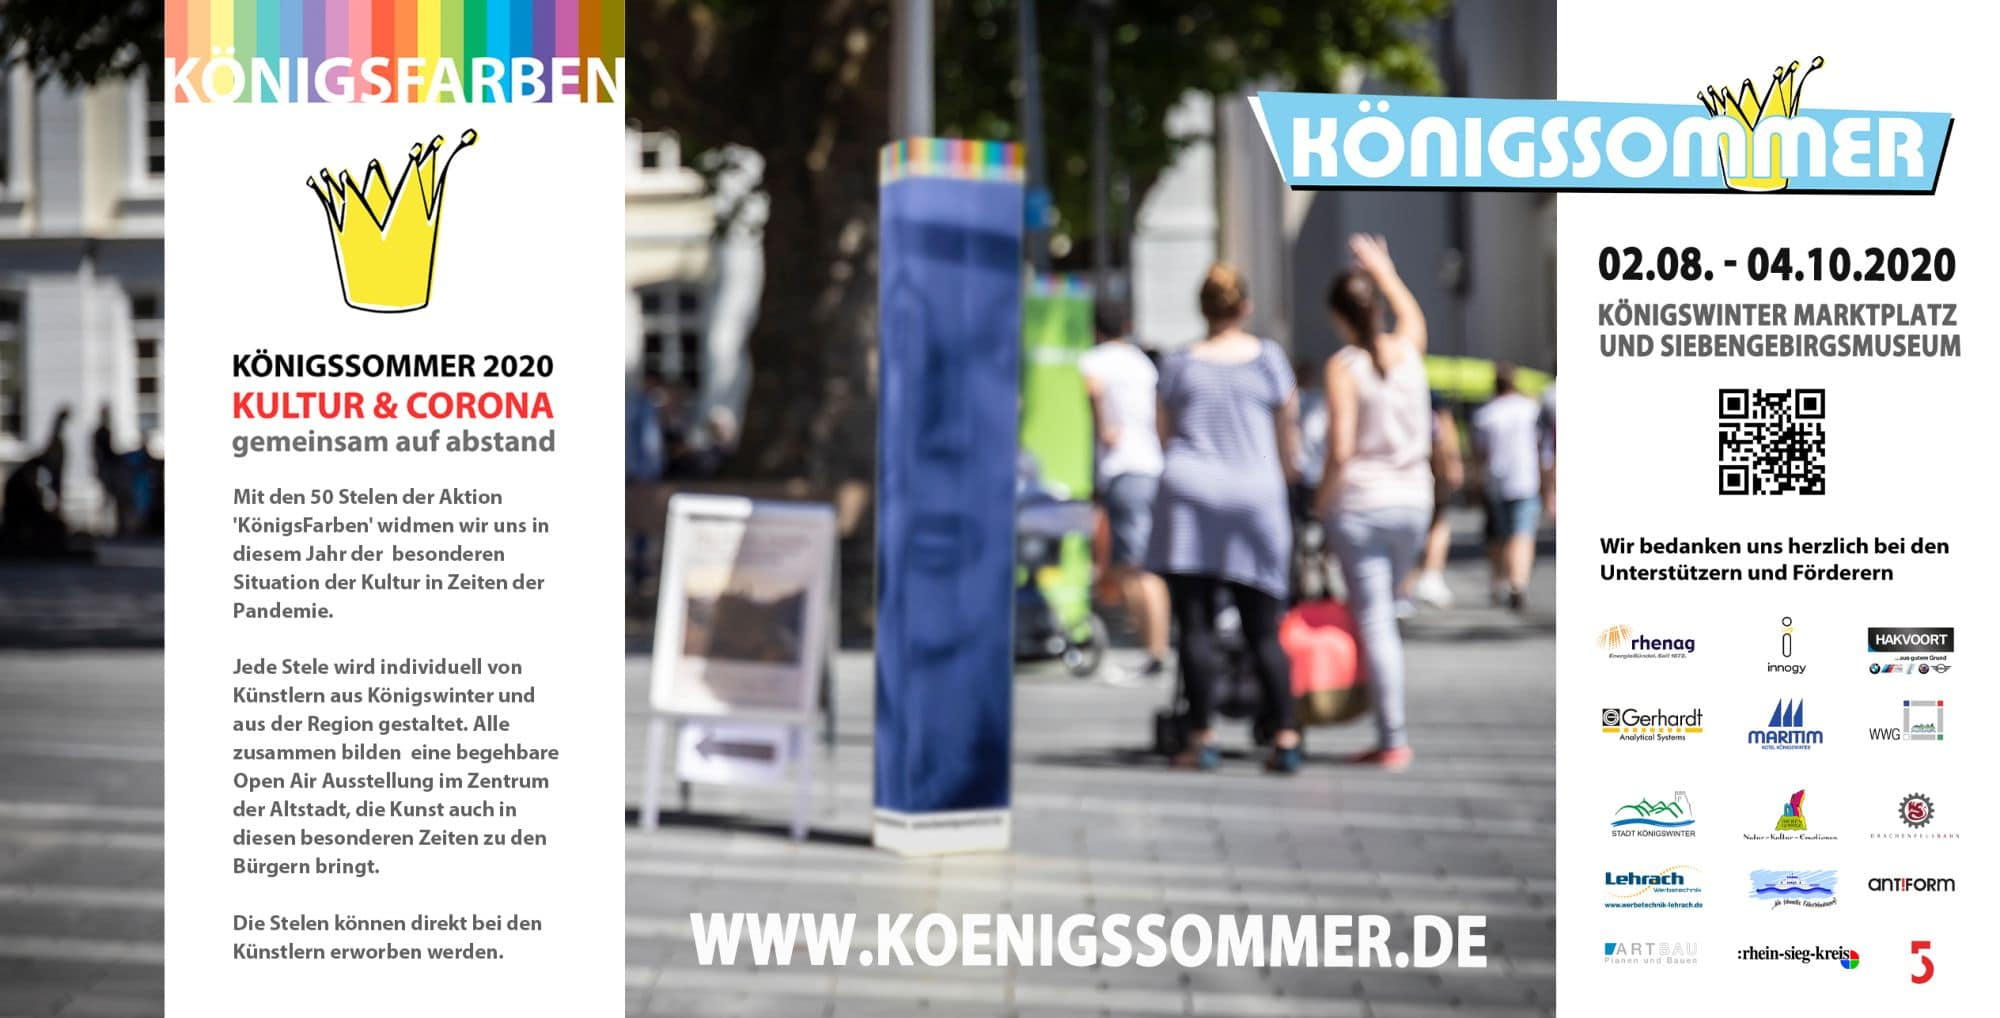 flyer königssommer2020 din lang rück 2 rgb 1 - Königssommer 2020 - KönigsFarben